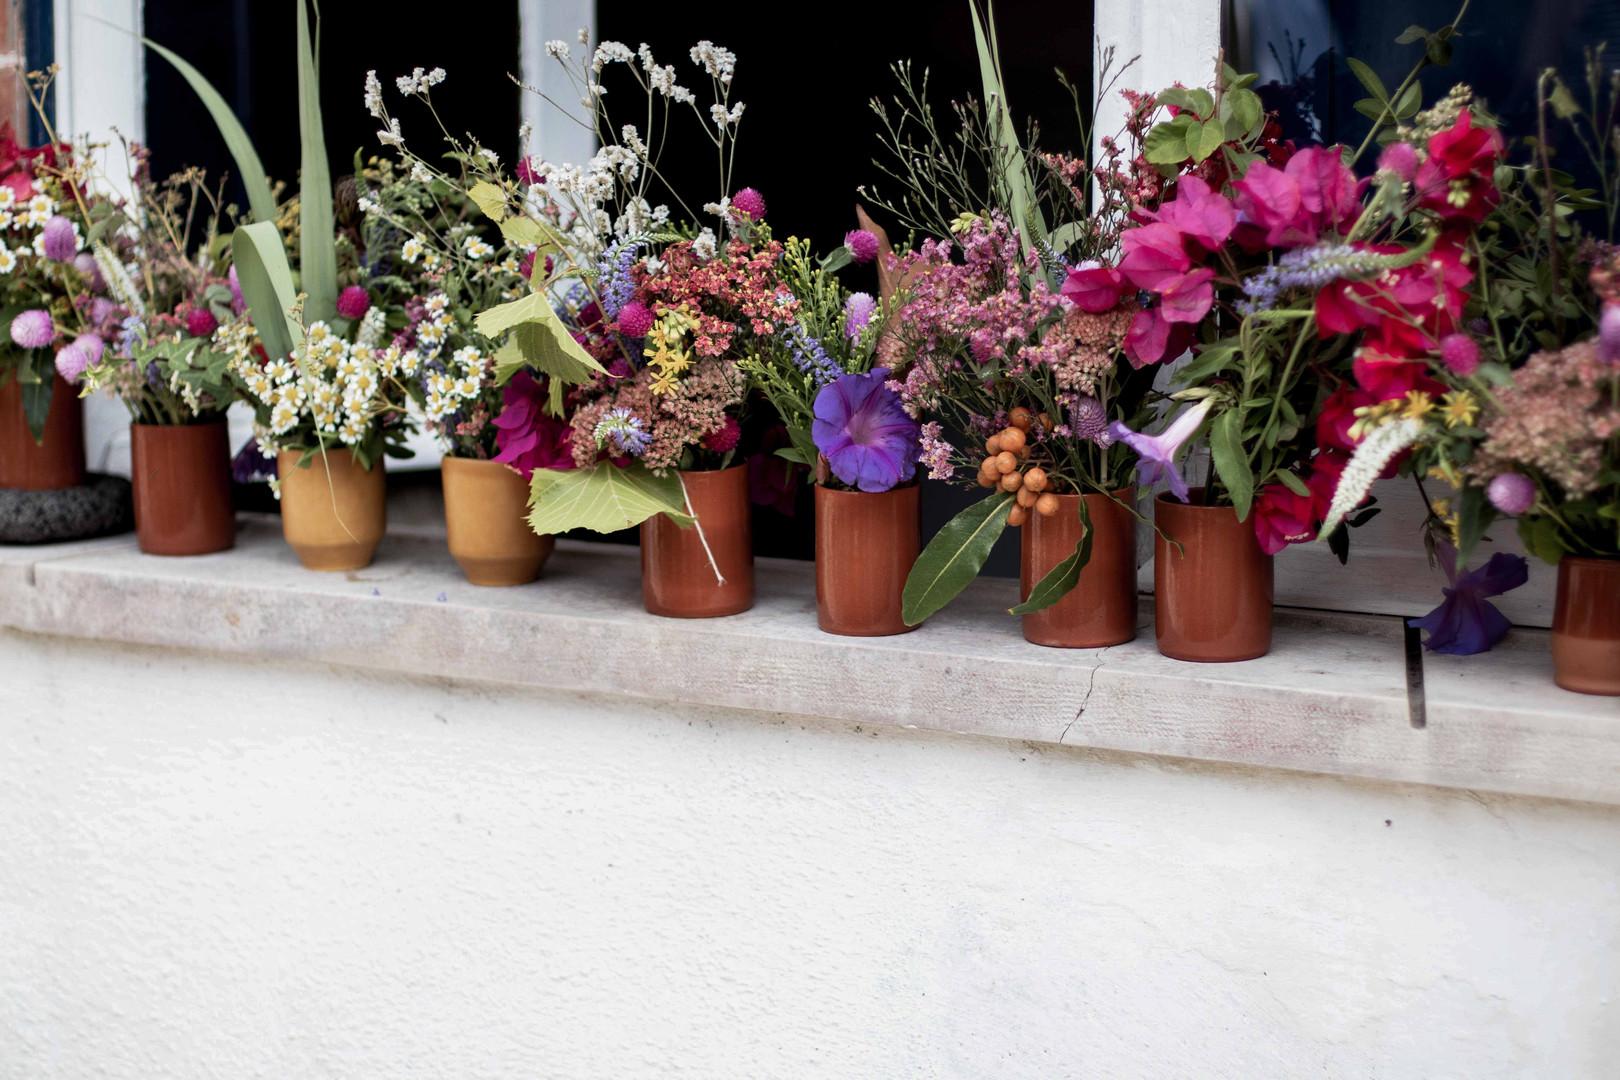 tessymorelli_Frolic_flowers_Halfmoon_ret